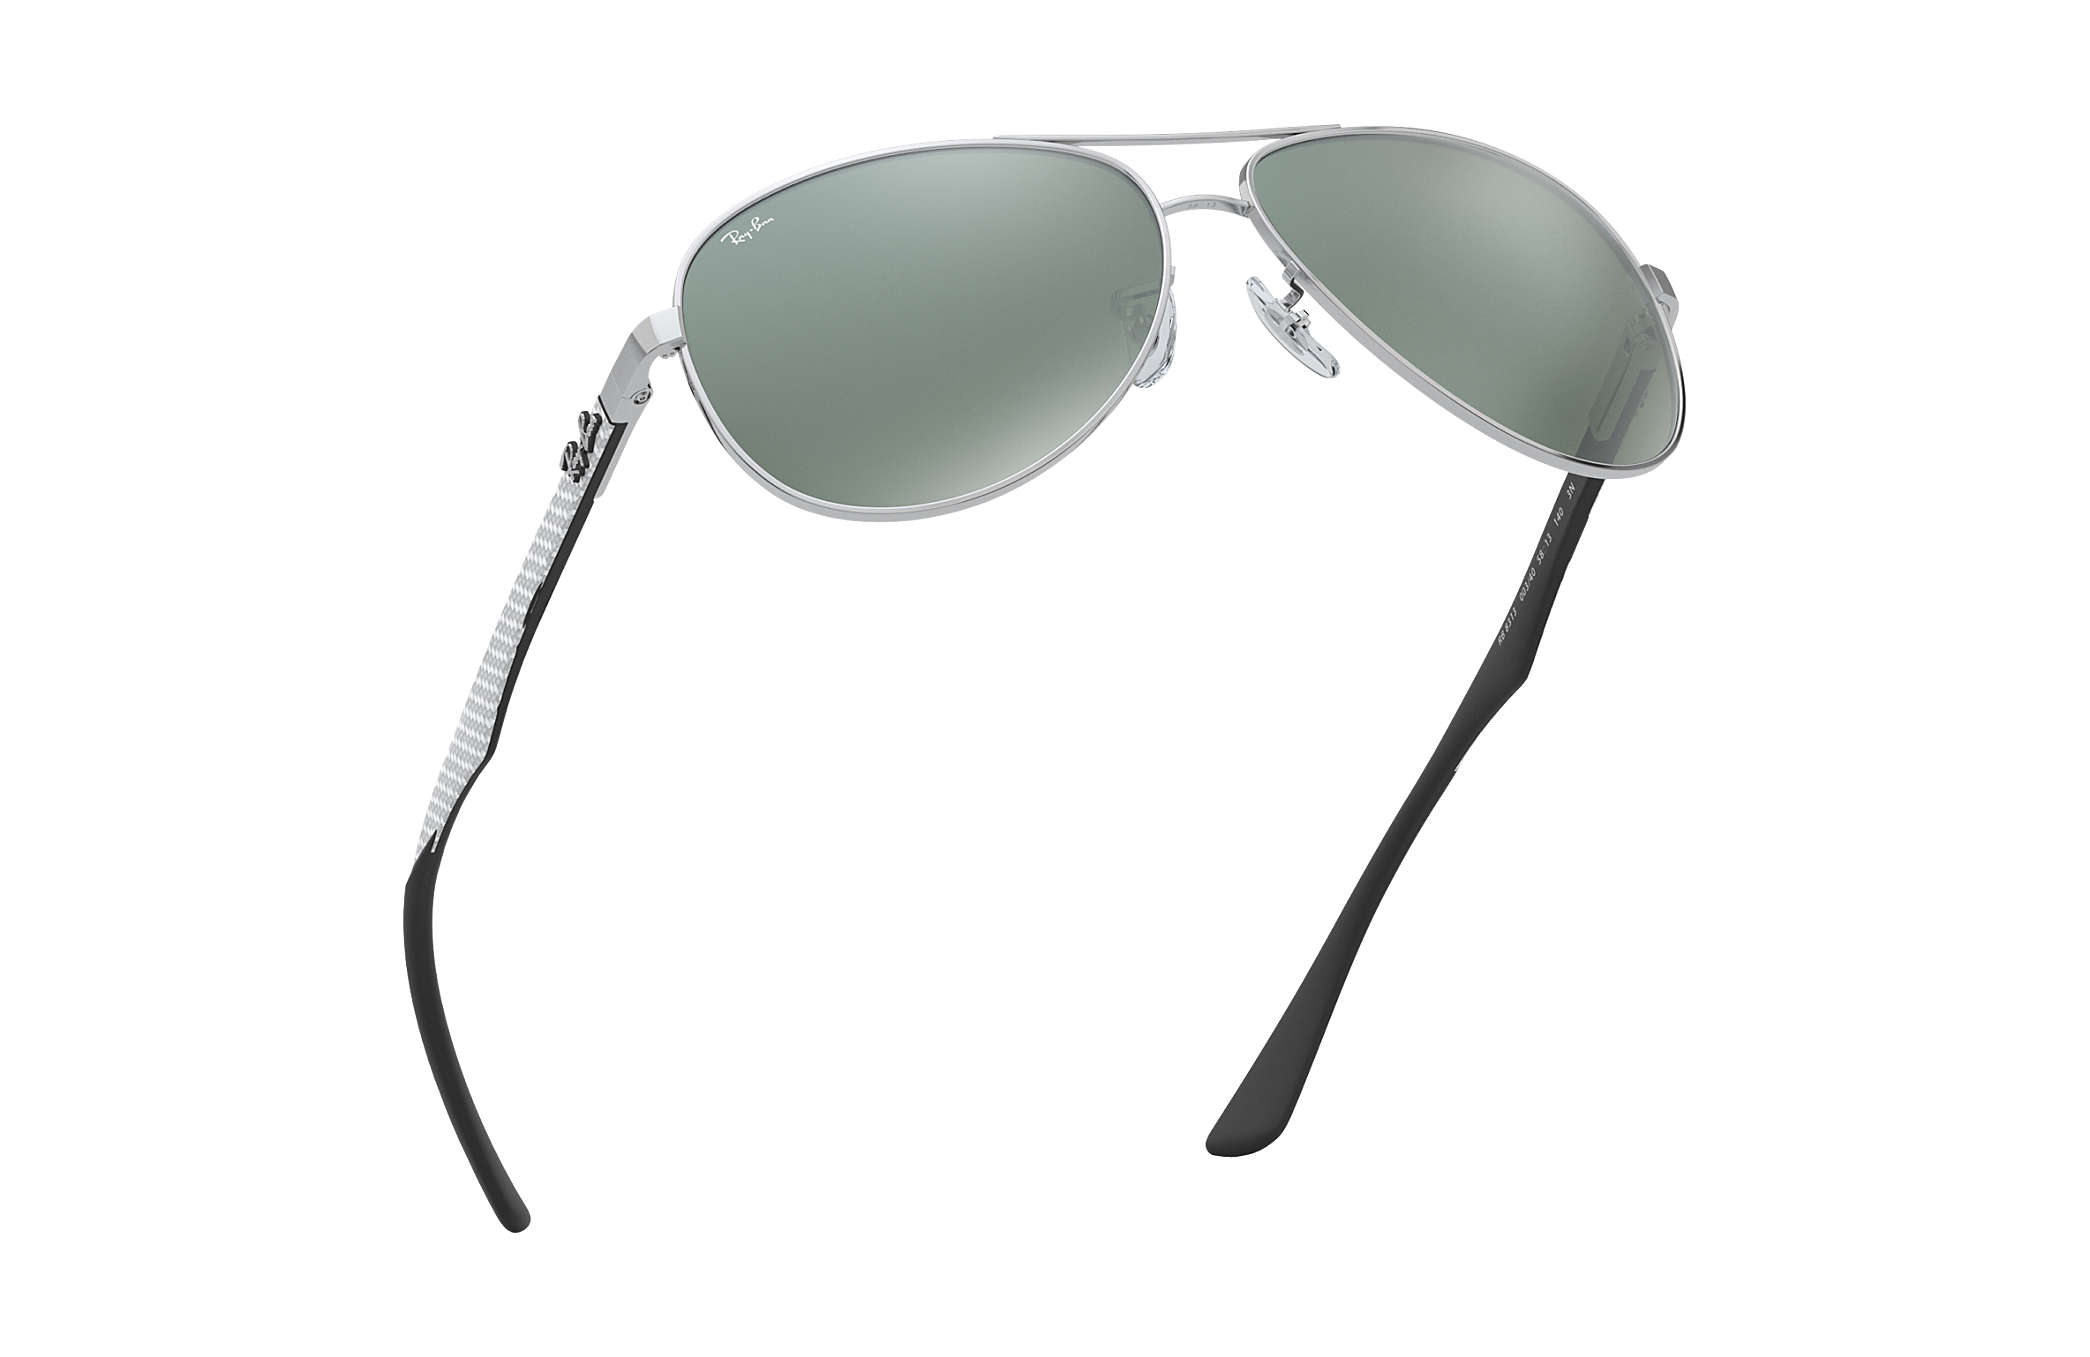 4b6a989c4de Ray-Ban RB8313 Silver - Carbon Fibre - Silver Lenses - 0RB8313003 ...